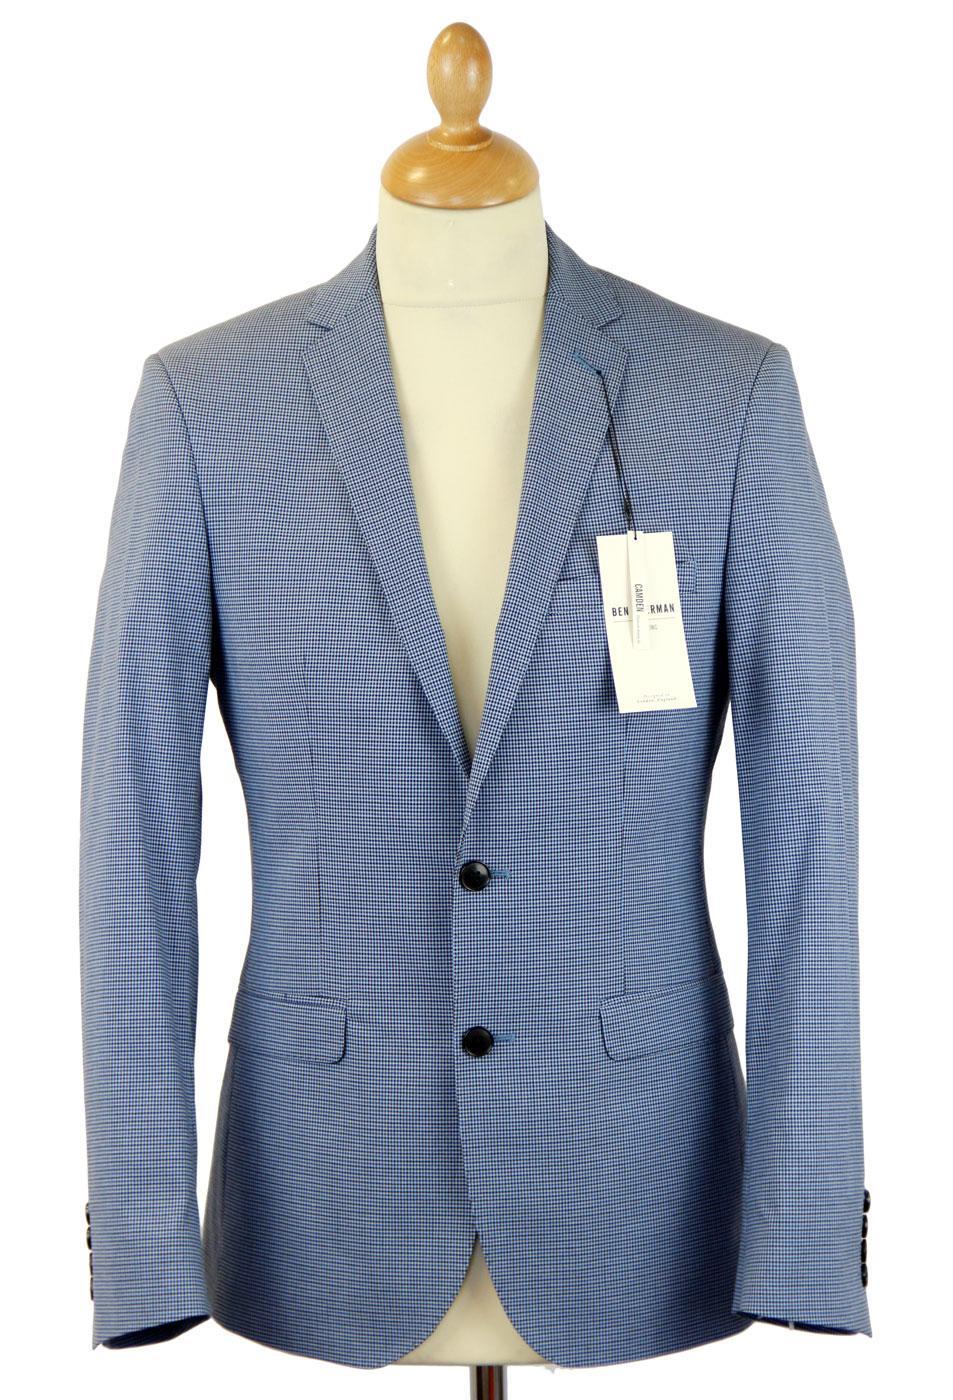 BEN SHERMAN Tailoring Mod Micro Check Notch Suit